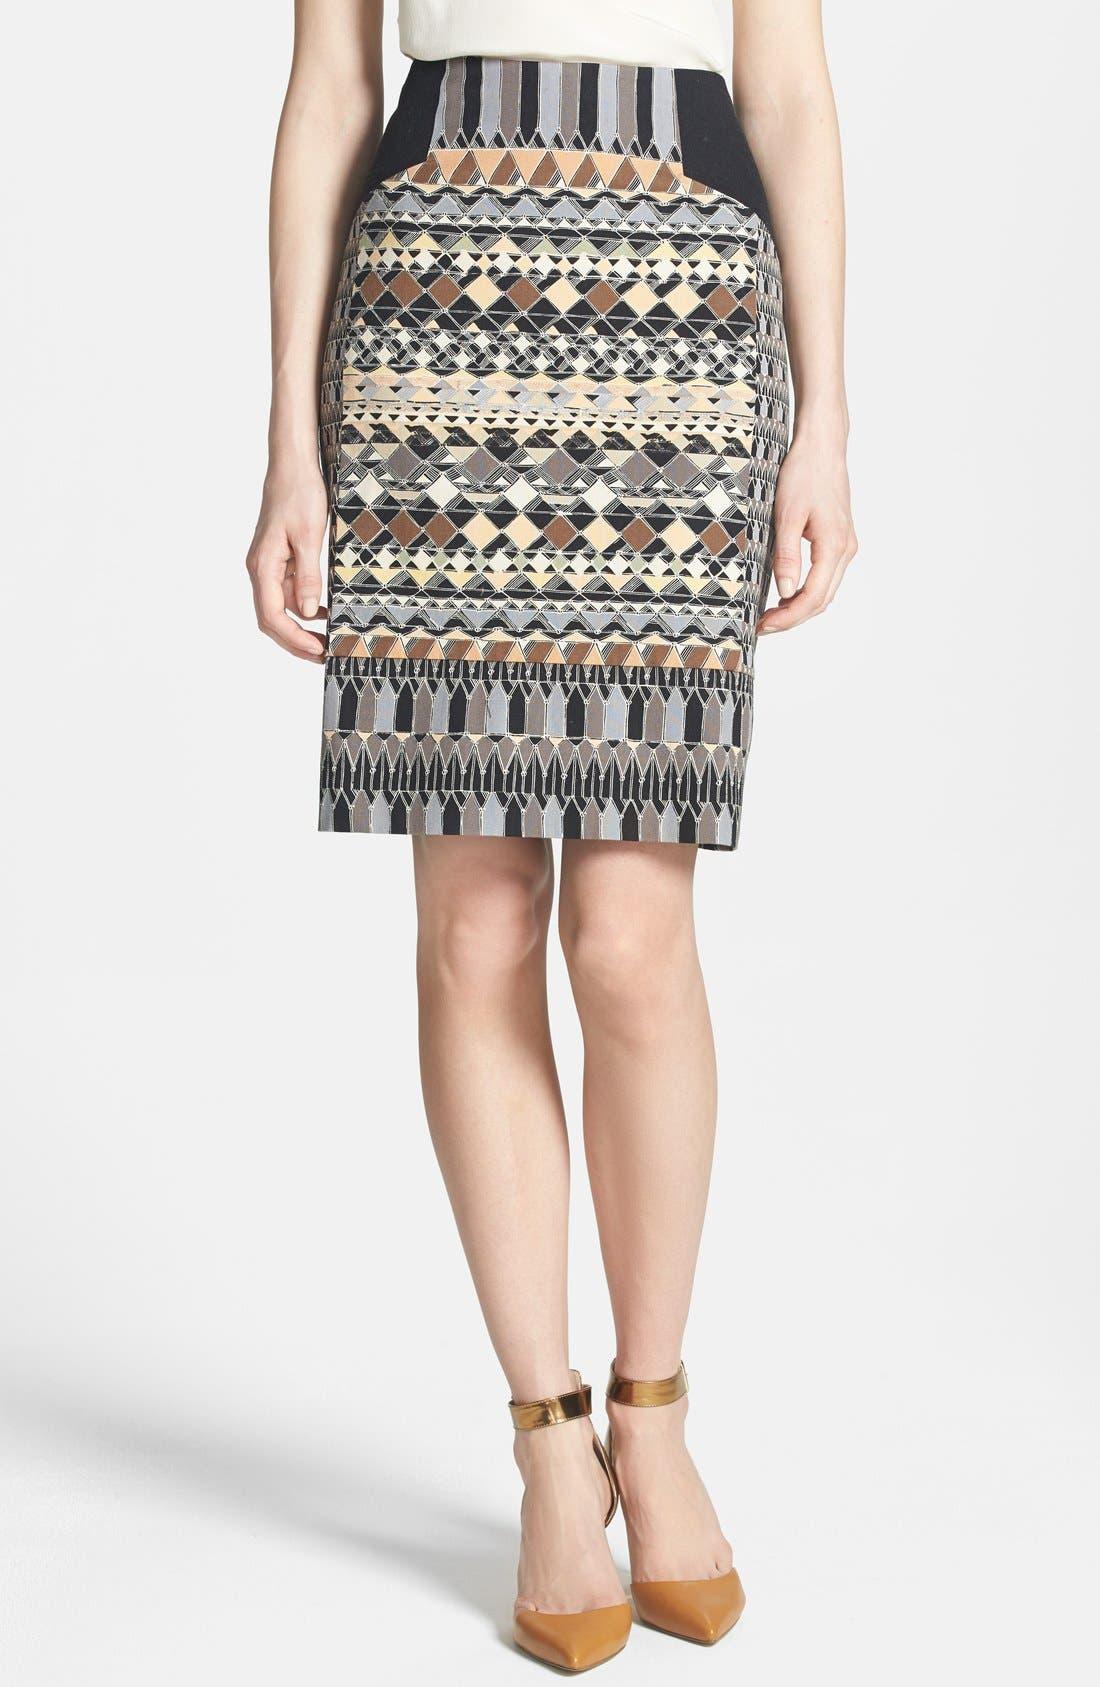 Alternate Image 1 Selected - NIC+ZOE 'Radiant Wink' Pencil Skirt